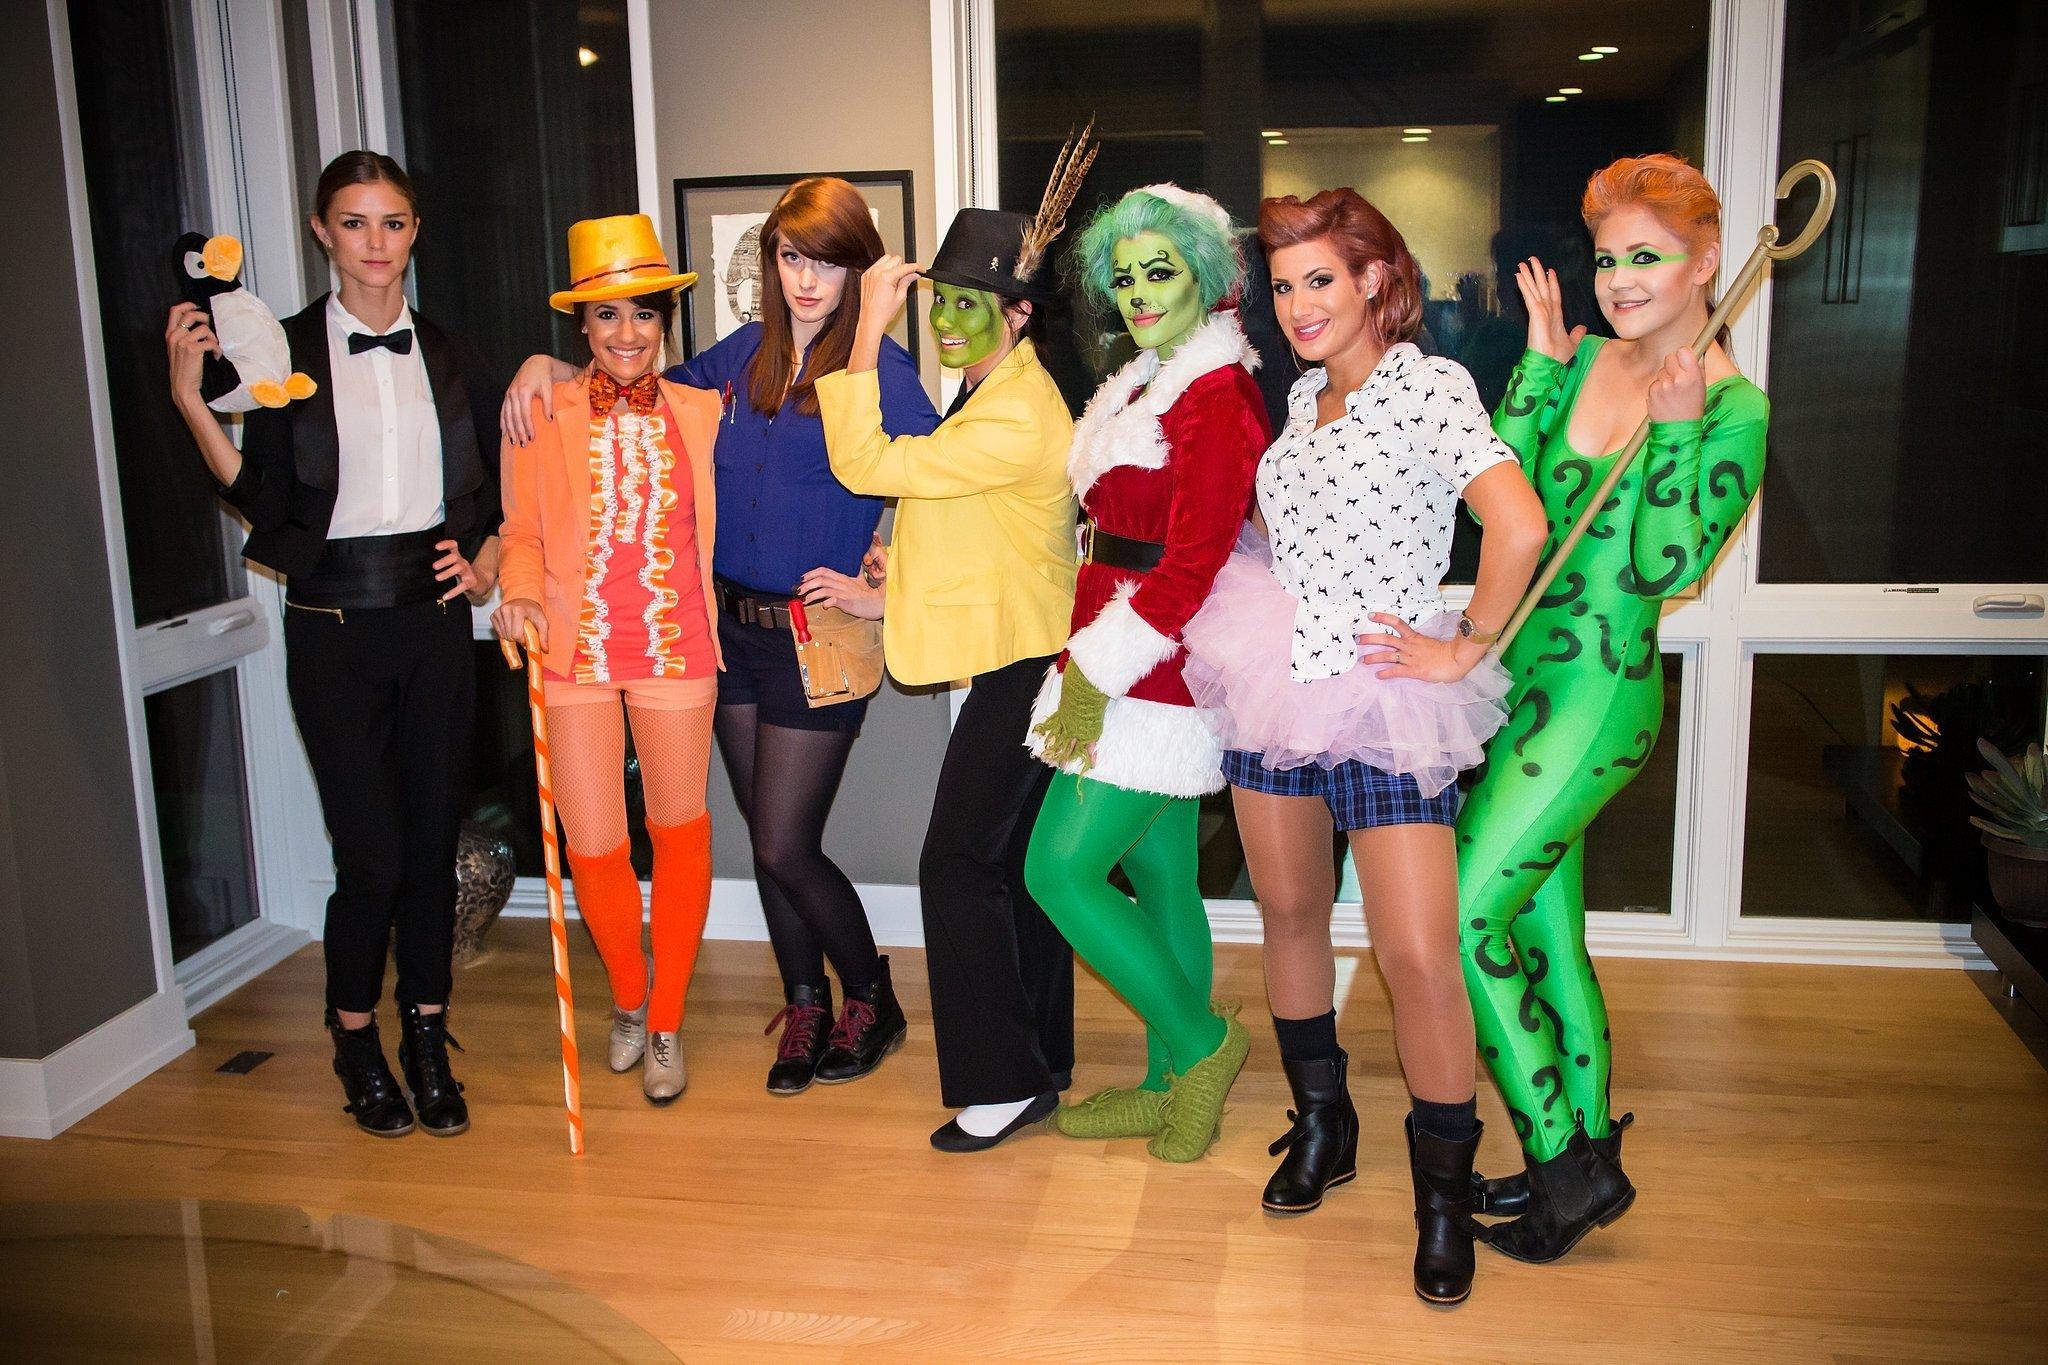 10 Most Popular Halloween Costume Ideas From Movies will ferrell group halloween costume photo popsugar entertainment